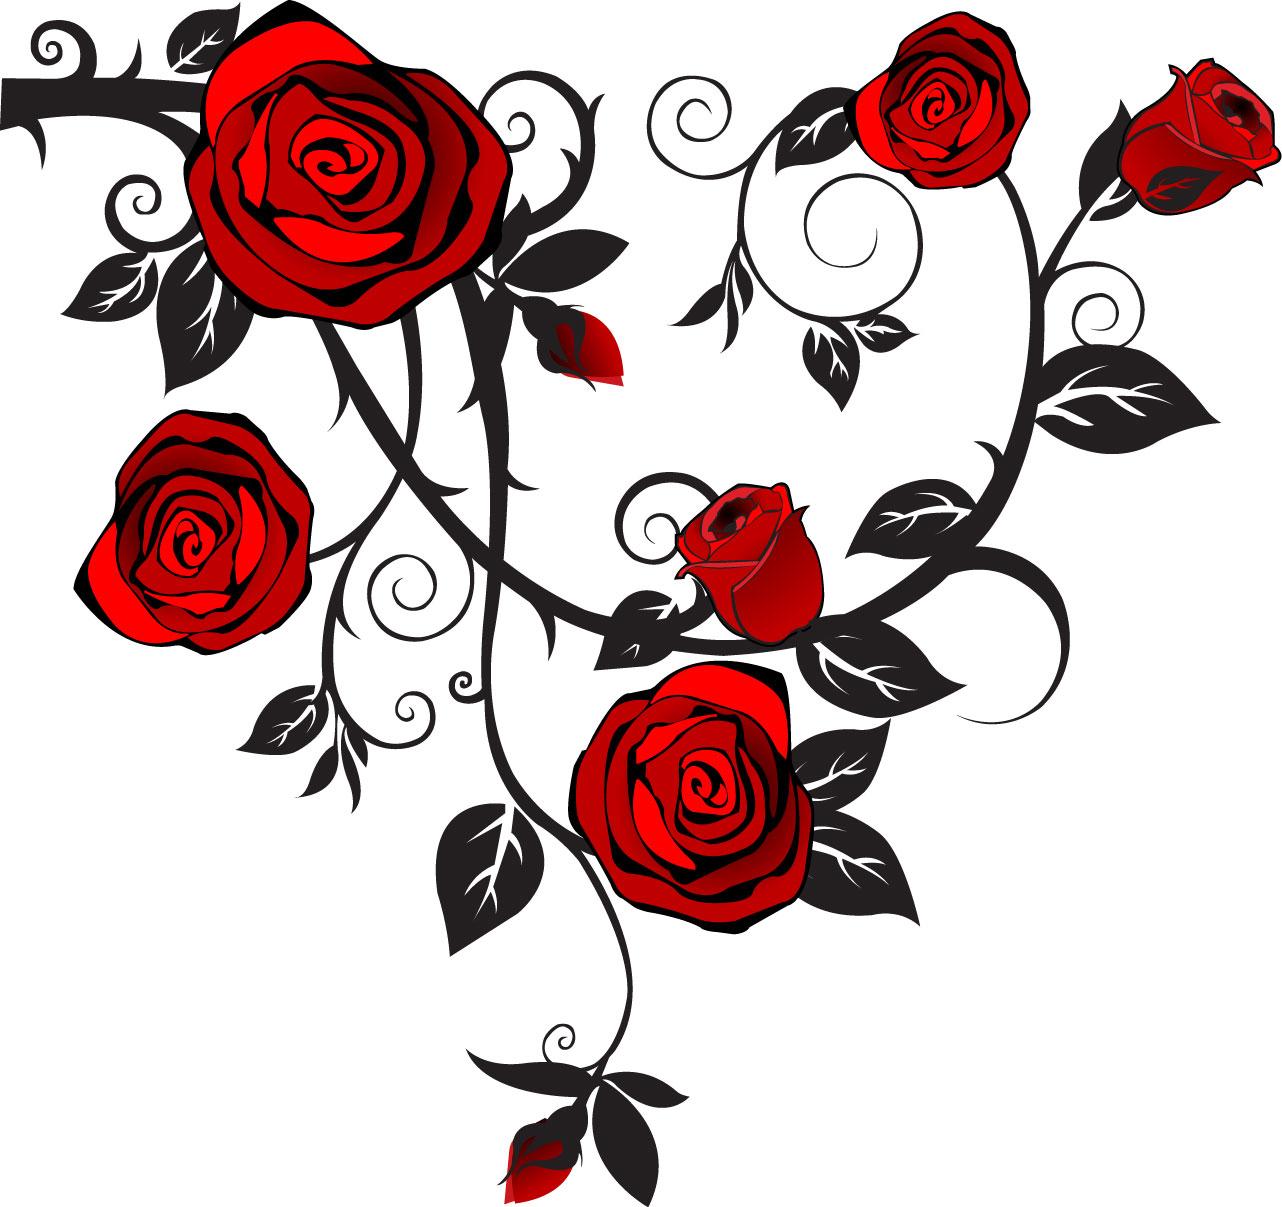 Tattoo Designs Clipart: Free Rose Tattoo Designs